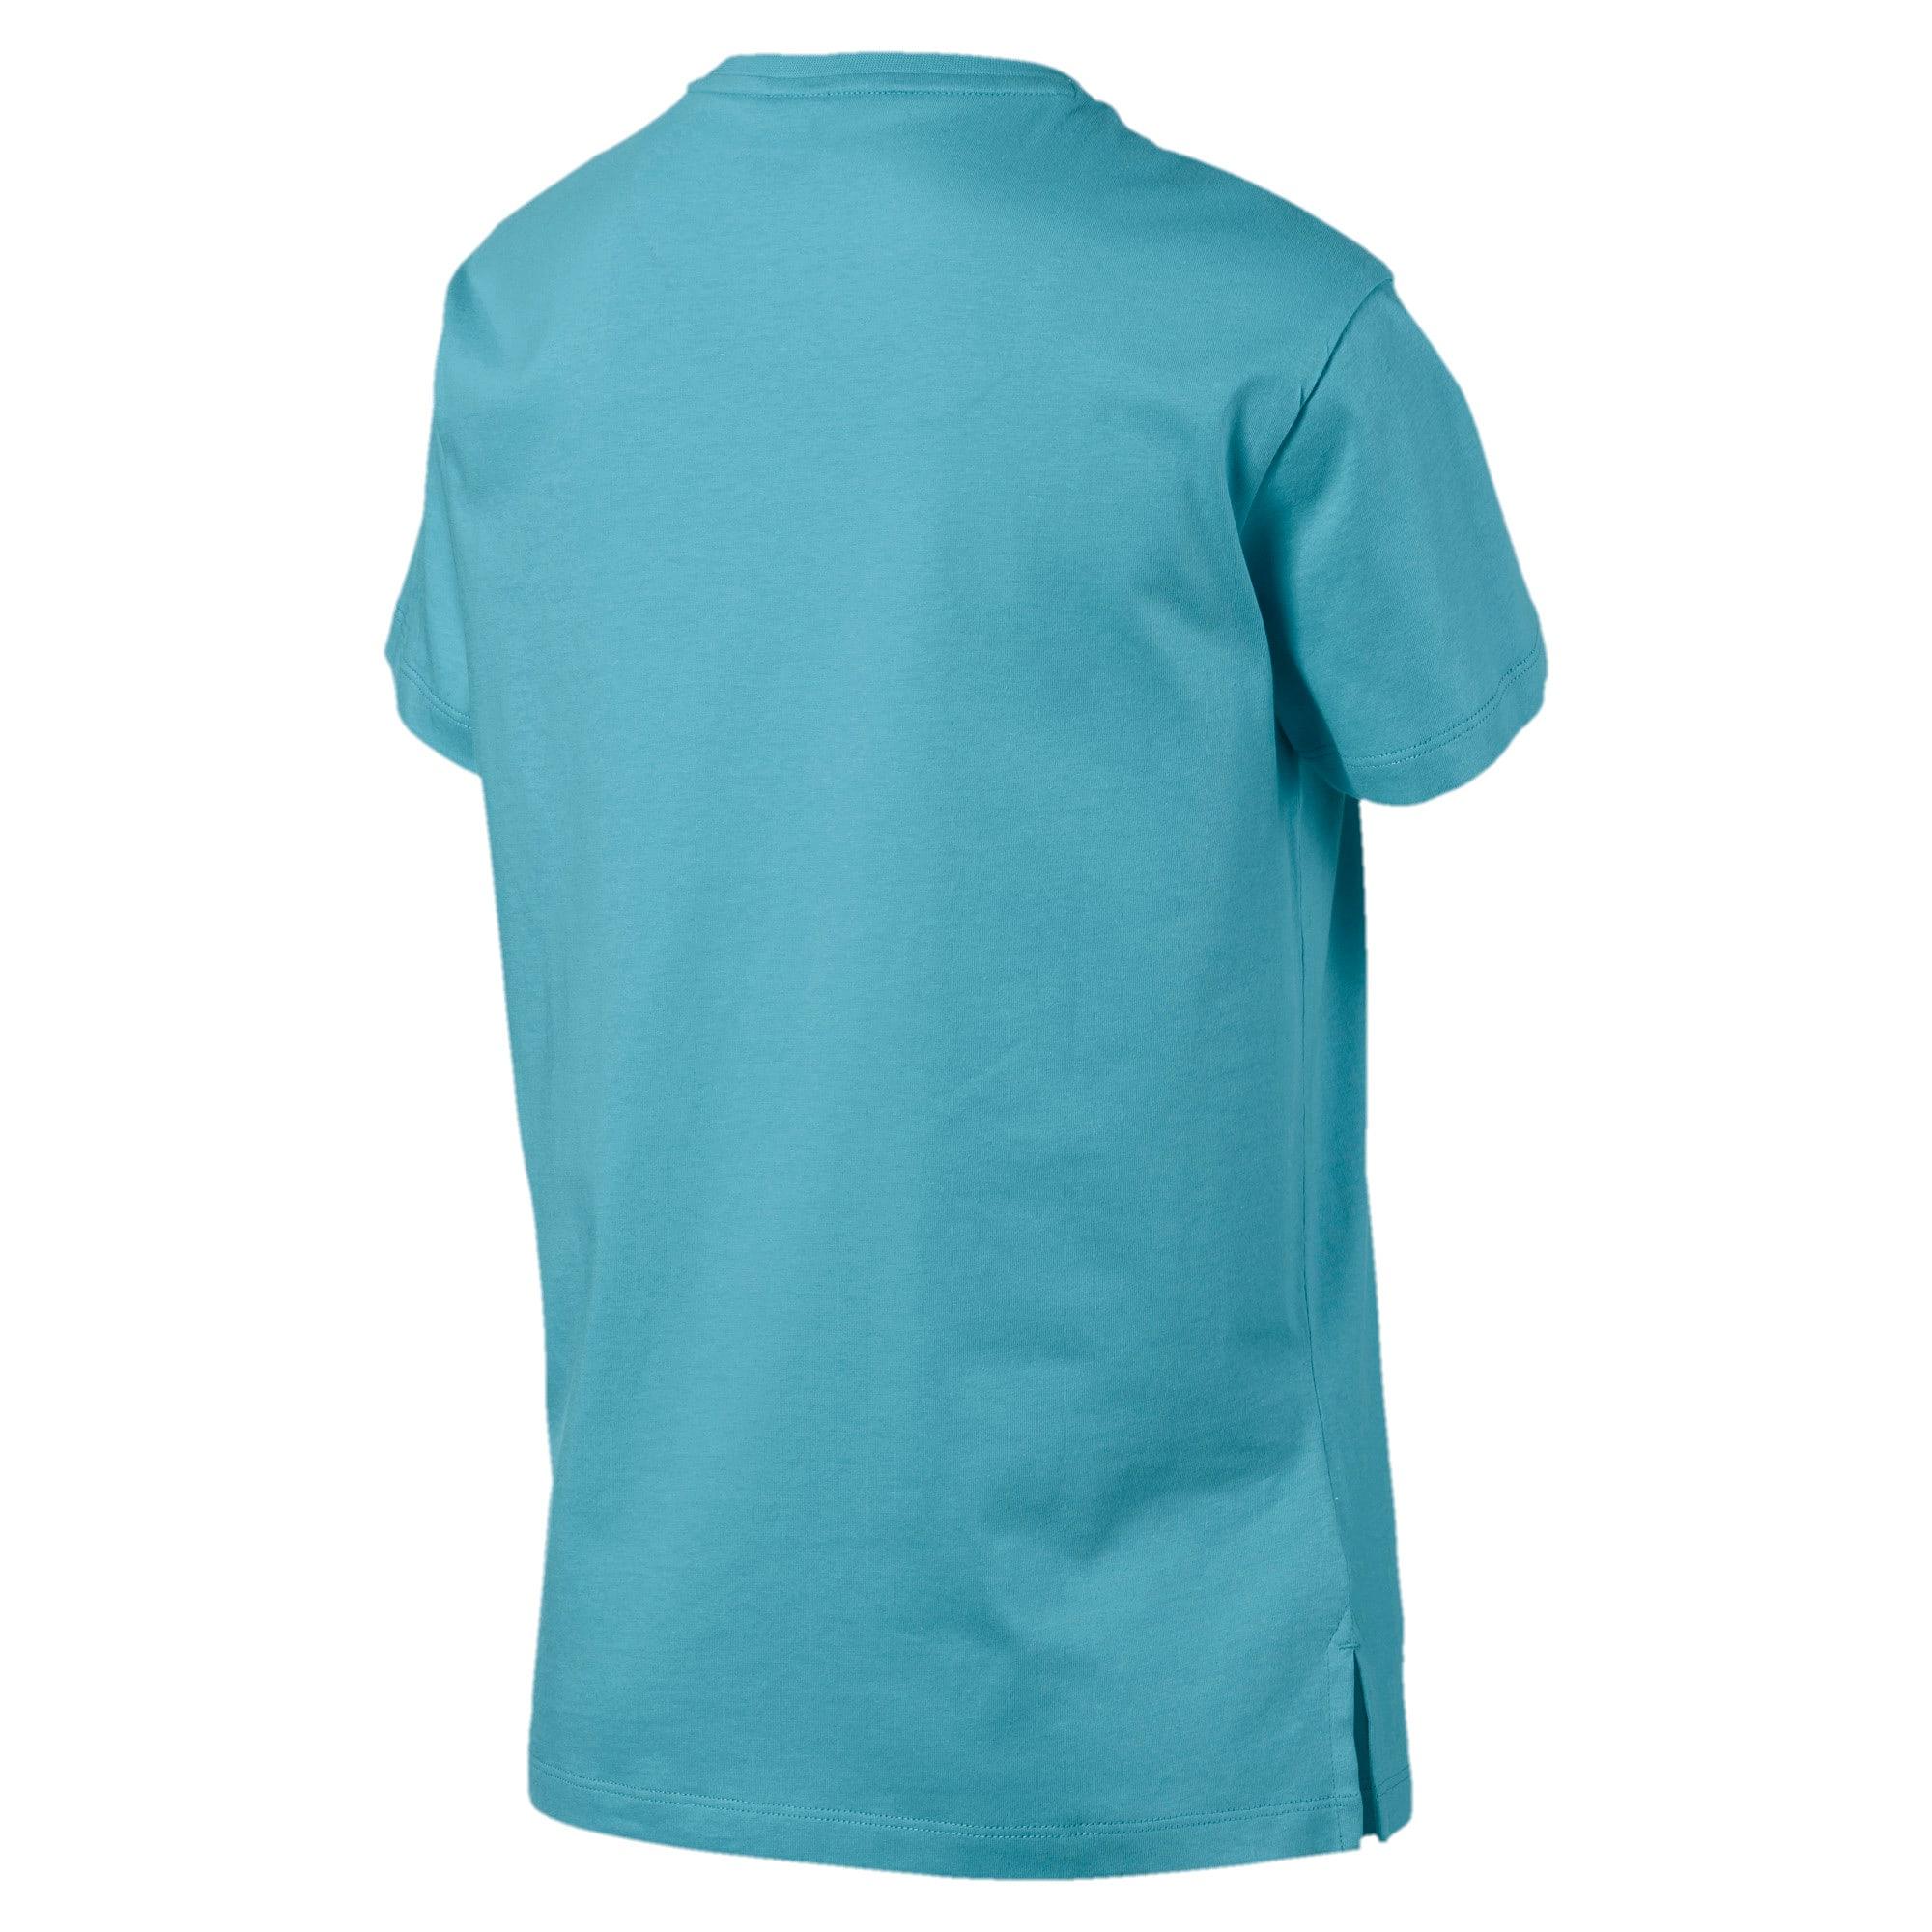 Thumbnail 5 of Classics Logo T-shirt voor dames, Milky Blue, medium